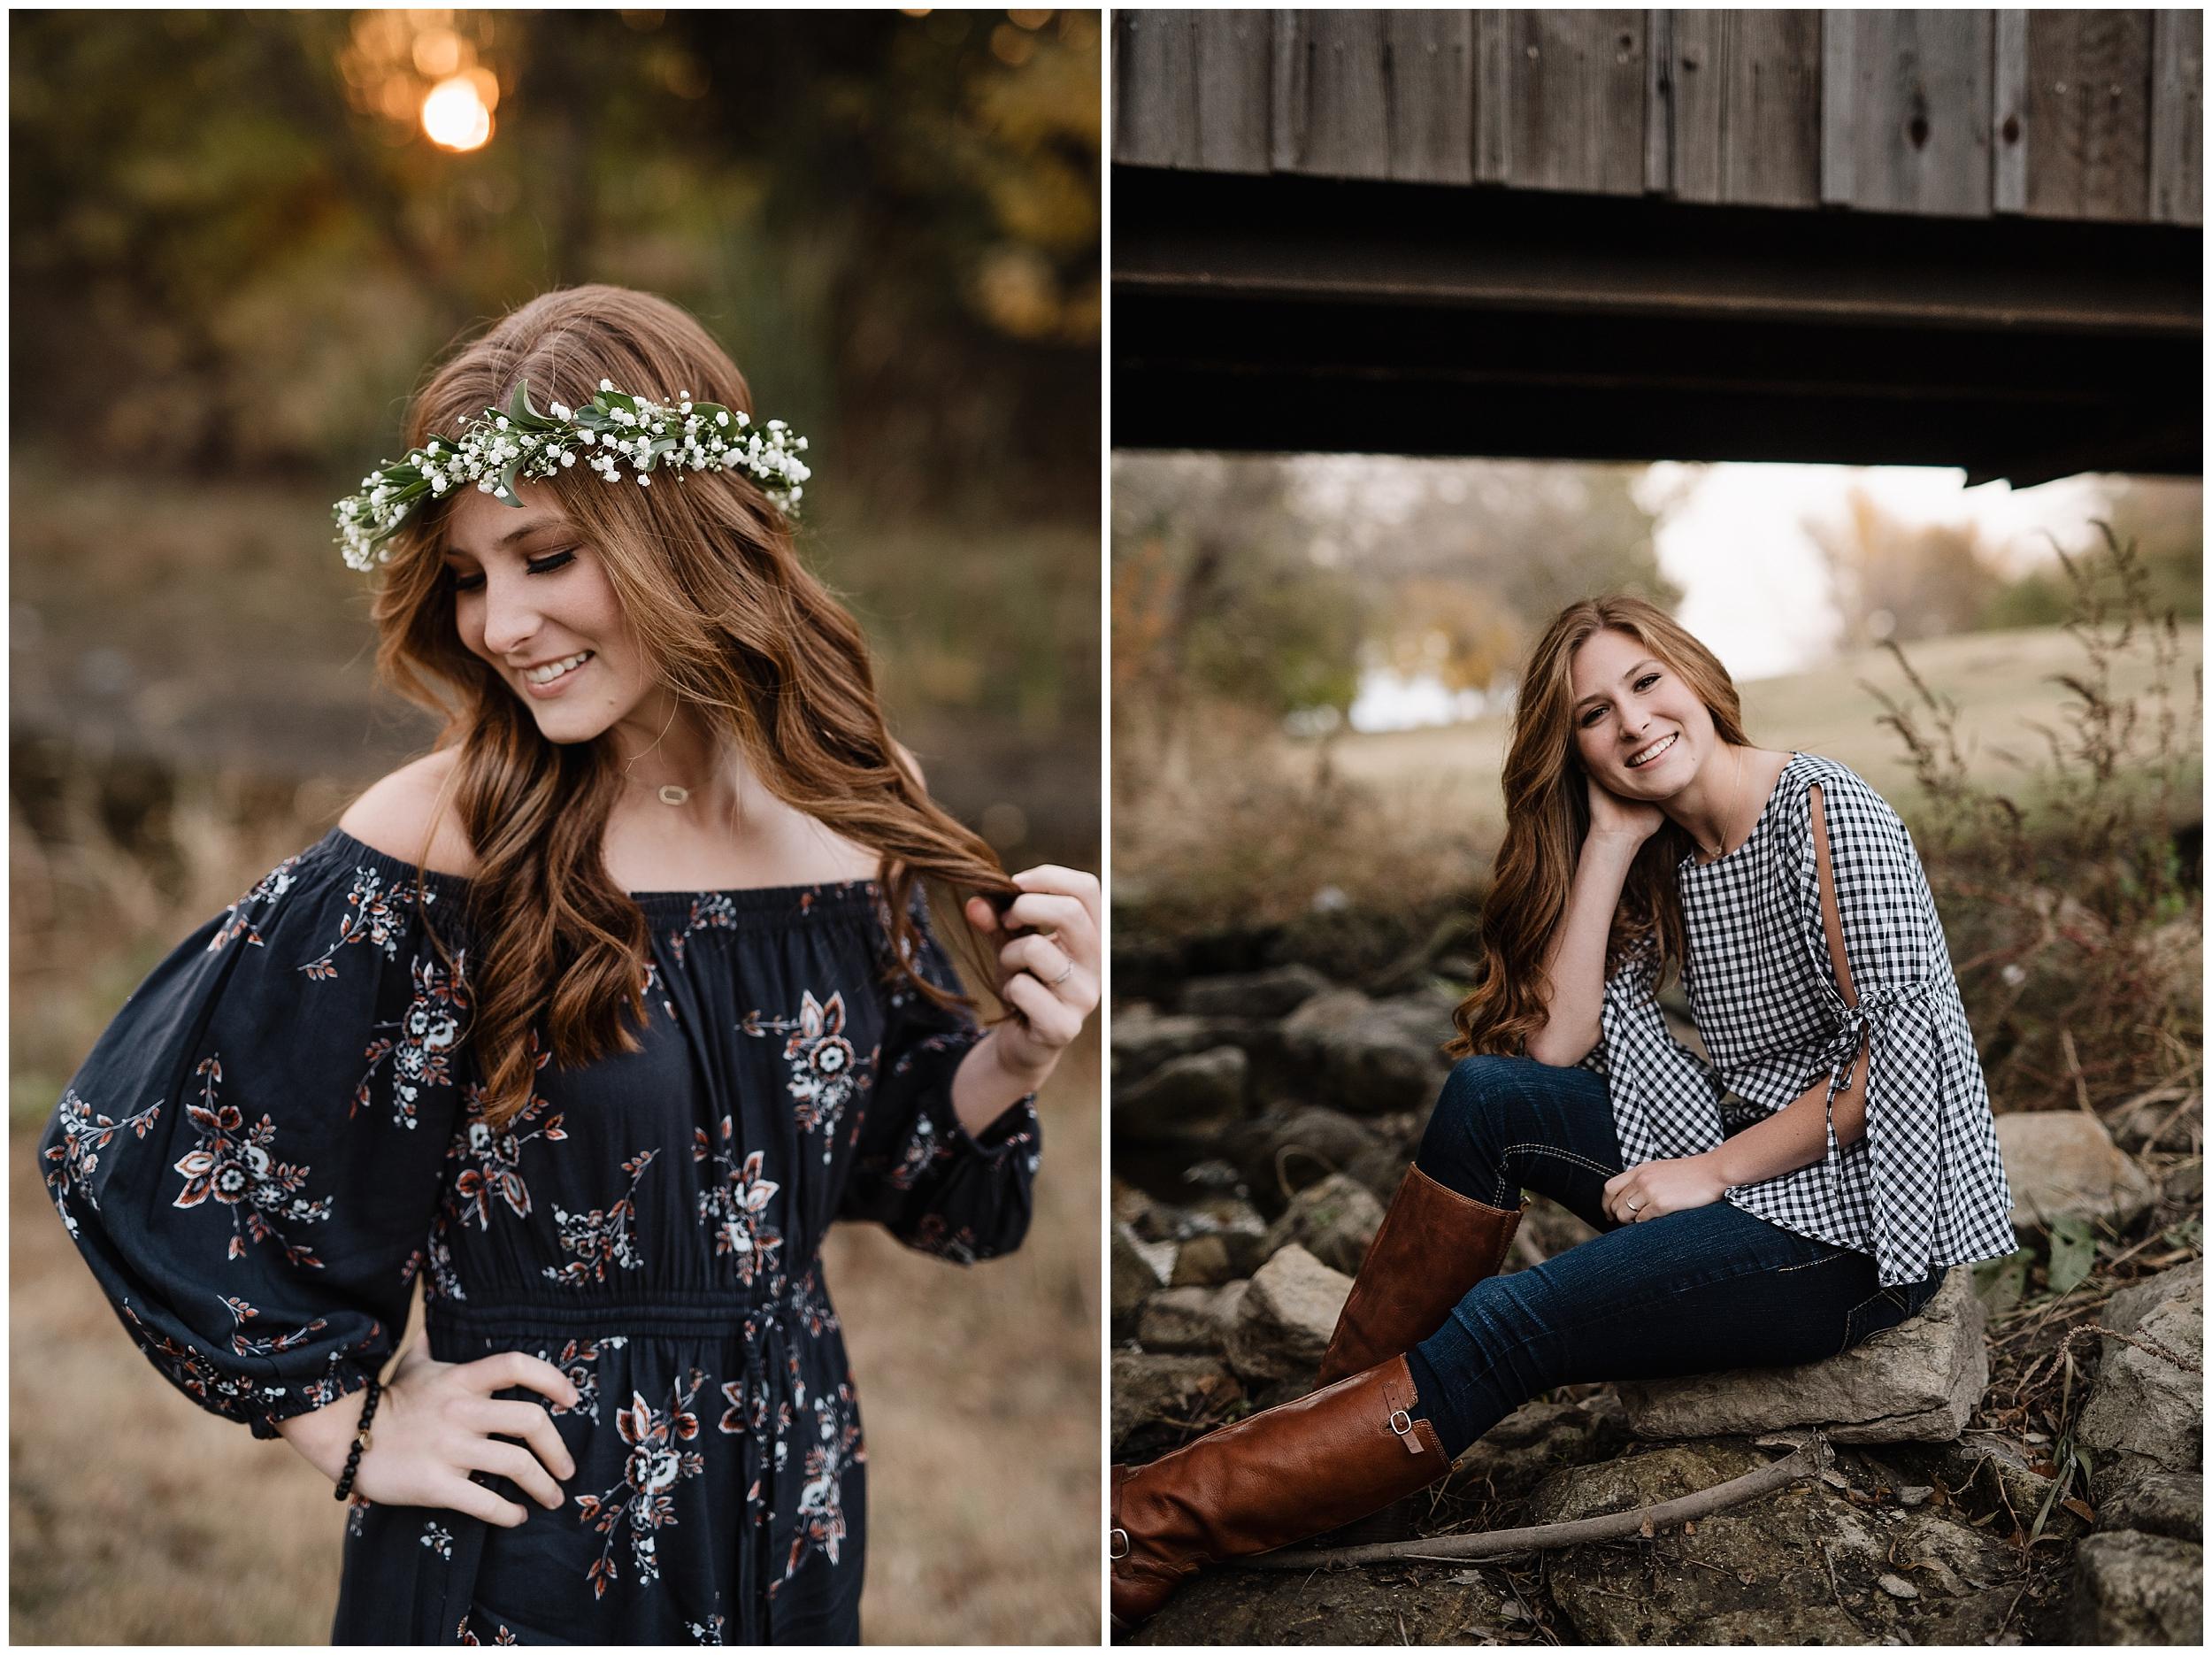 oklahoma wedding photographer portrait senior high school outdoor beautiful nature wichita kansas flower crown